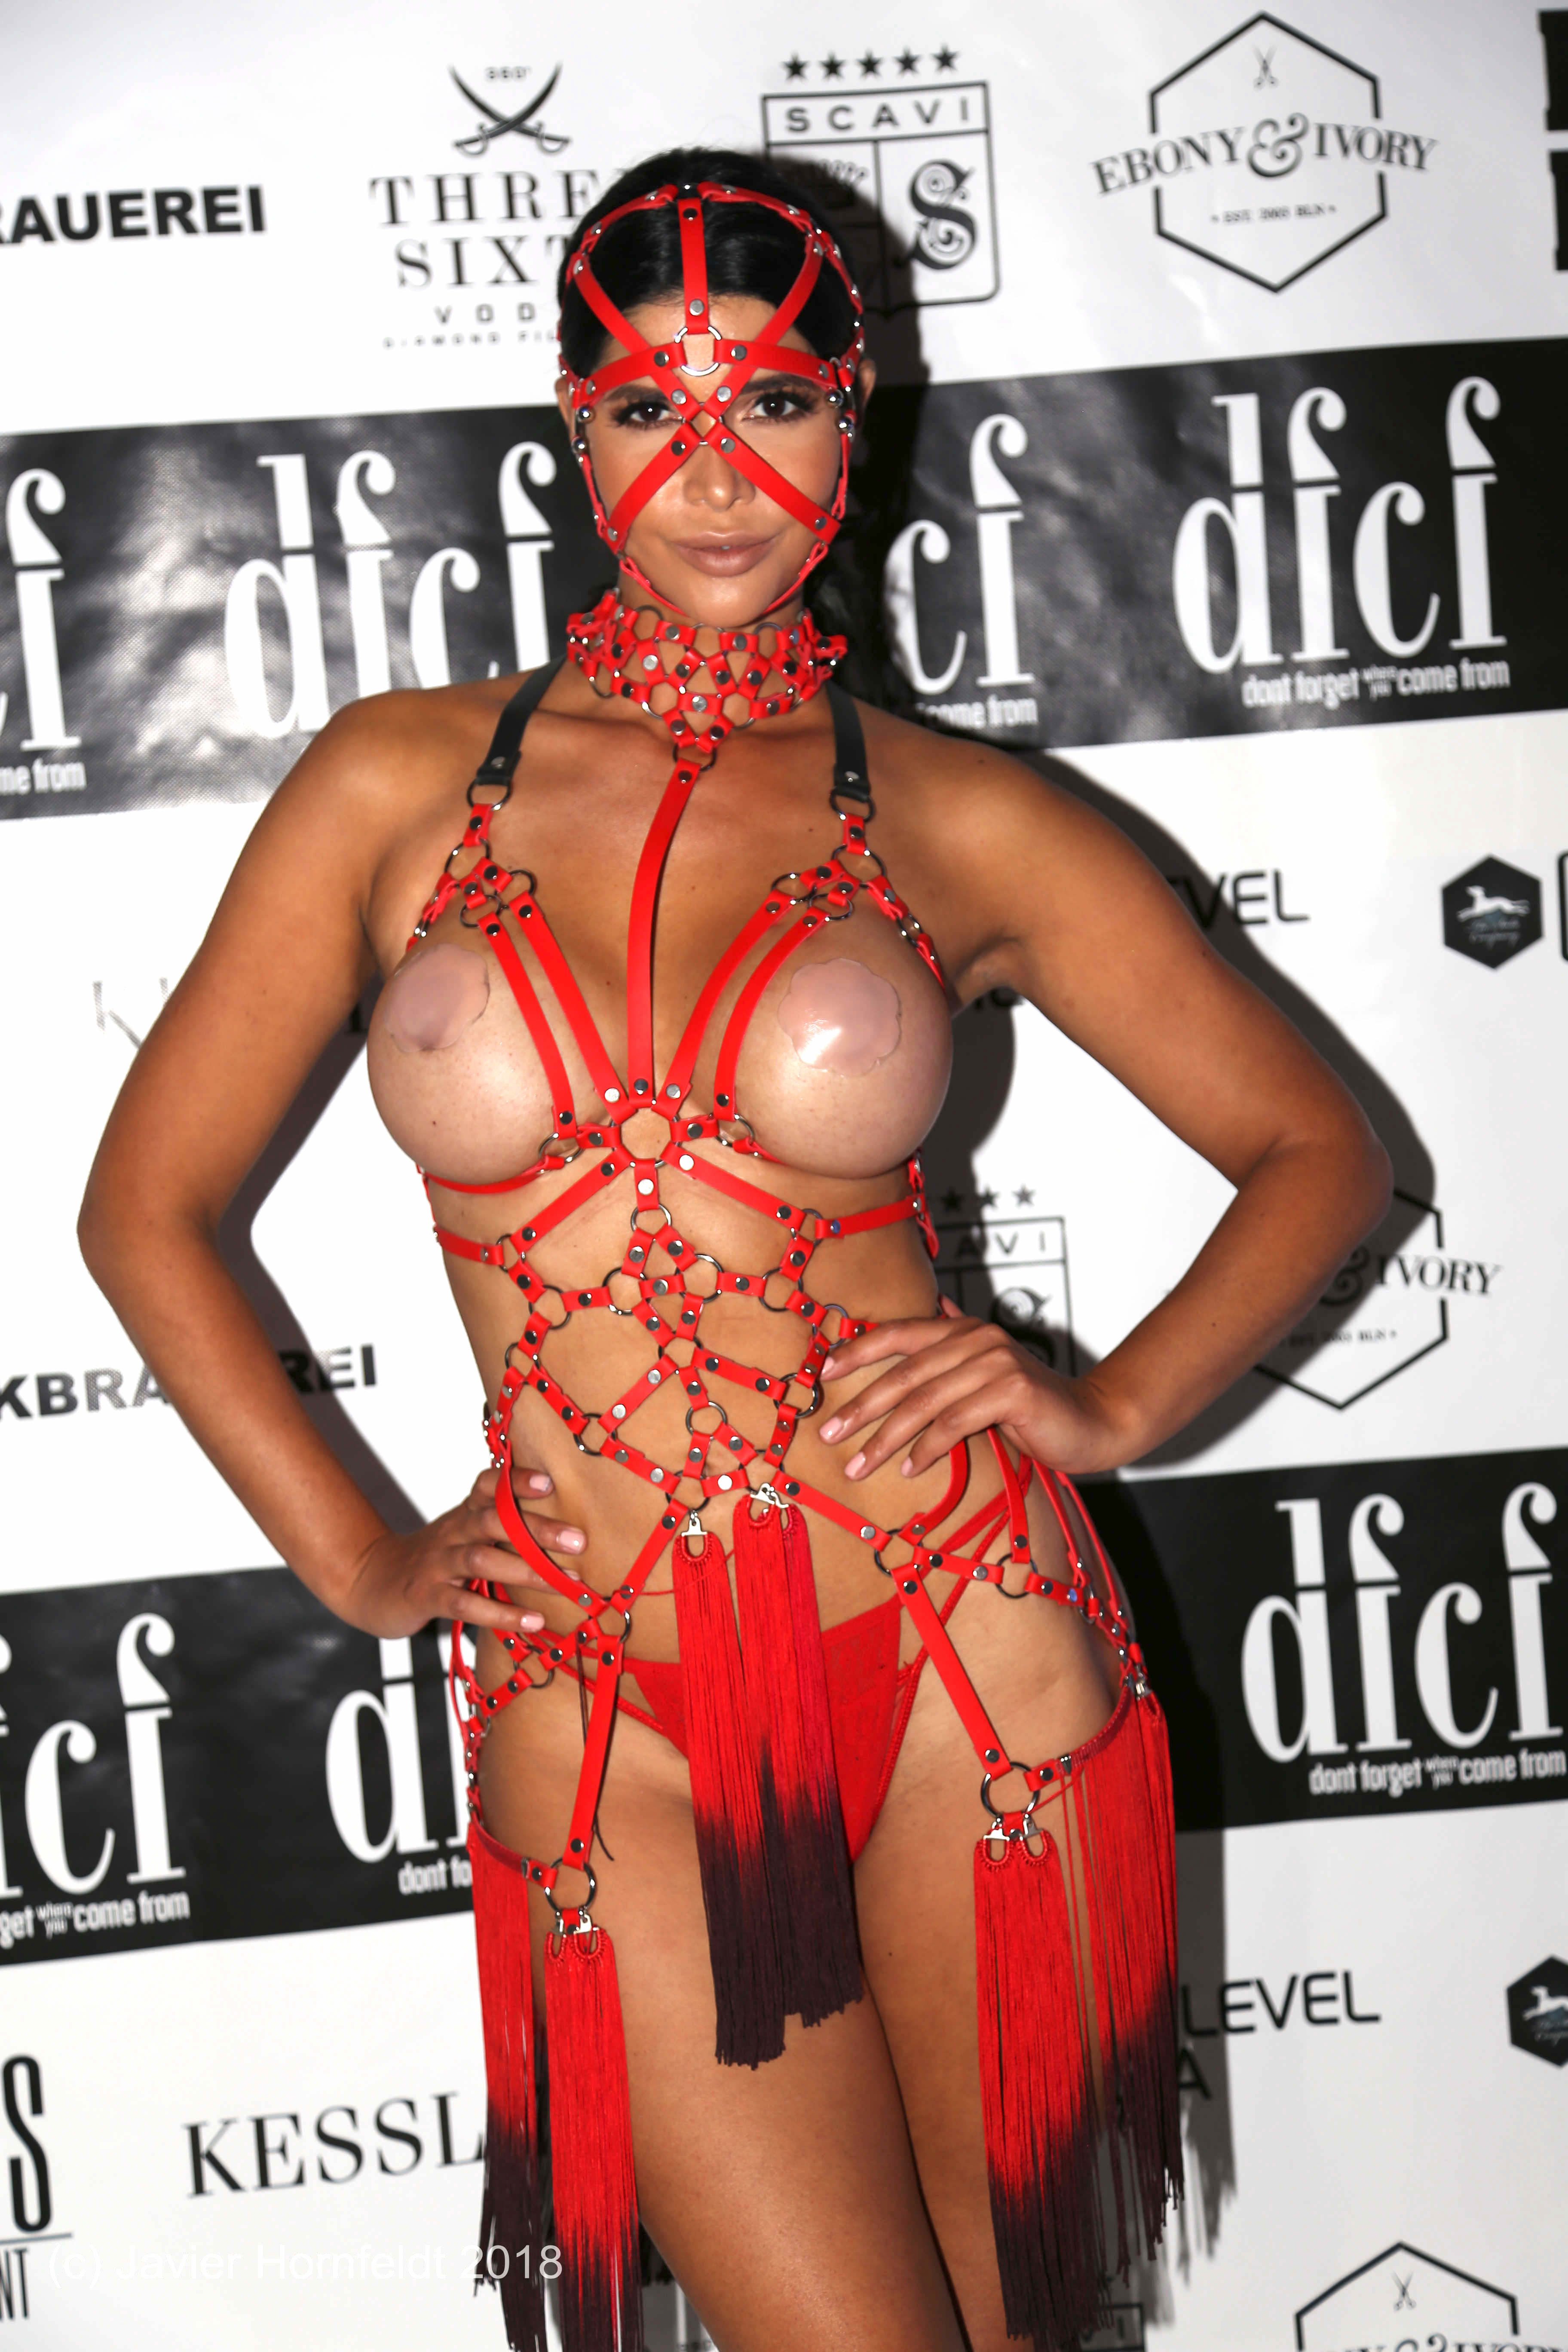 Micaela-Sch%C3%A4fer-Nude-TheFappeningBlog.com-10.jpg